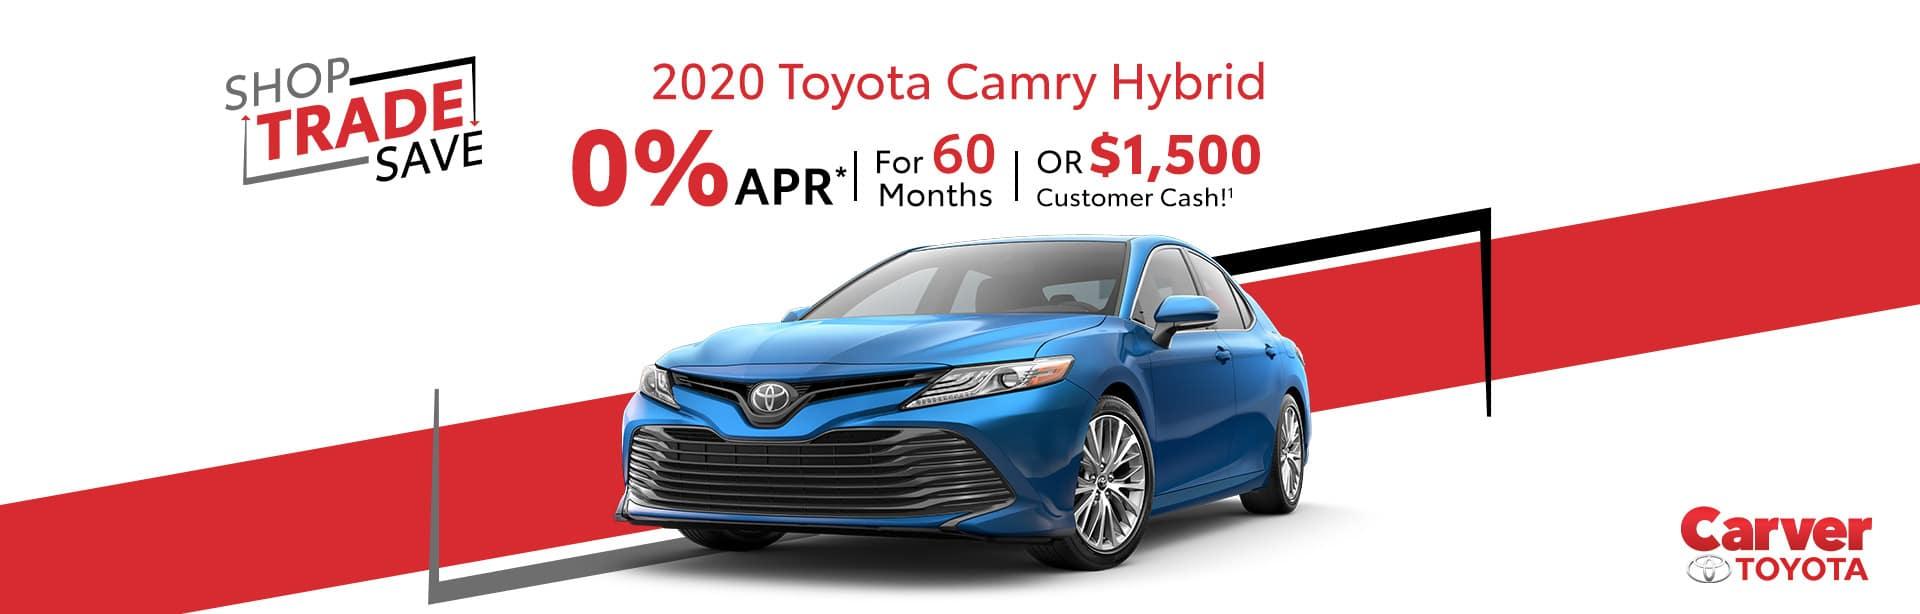 Lease a 2020 Camry Hybrid near Franklin, Indiana